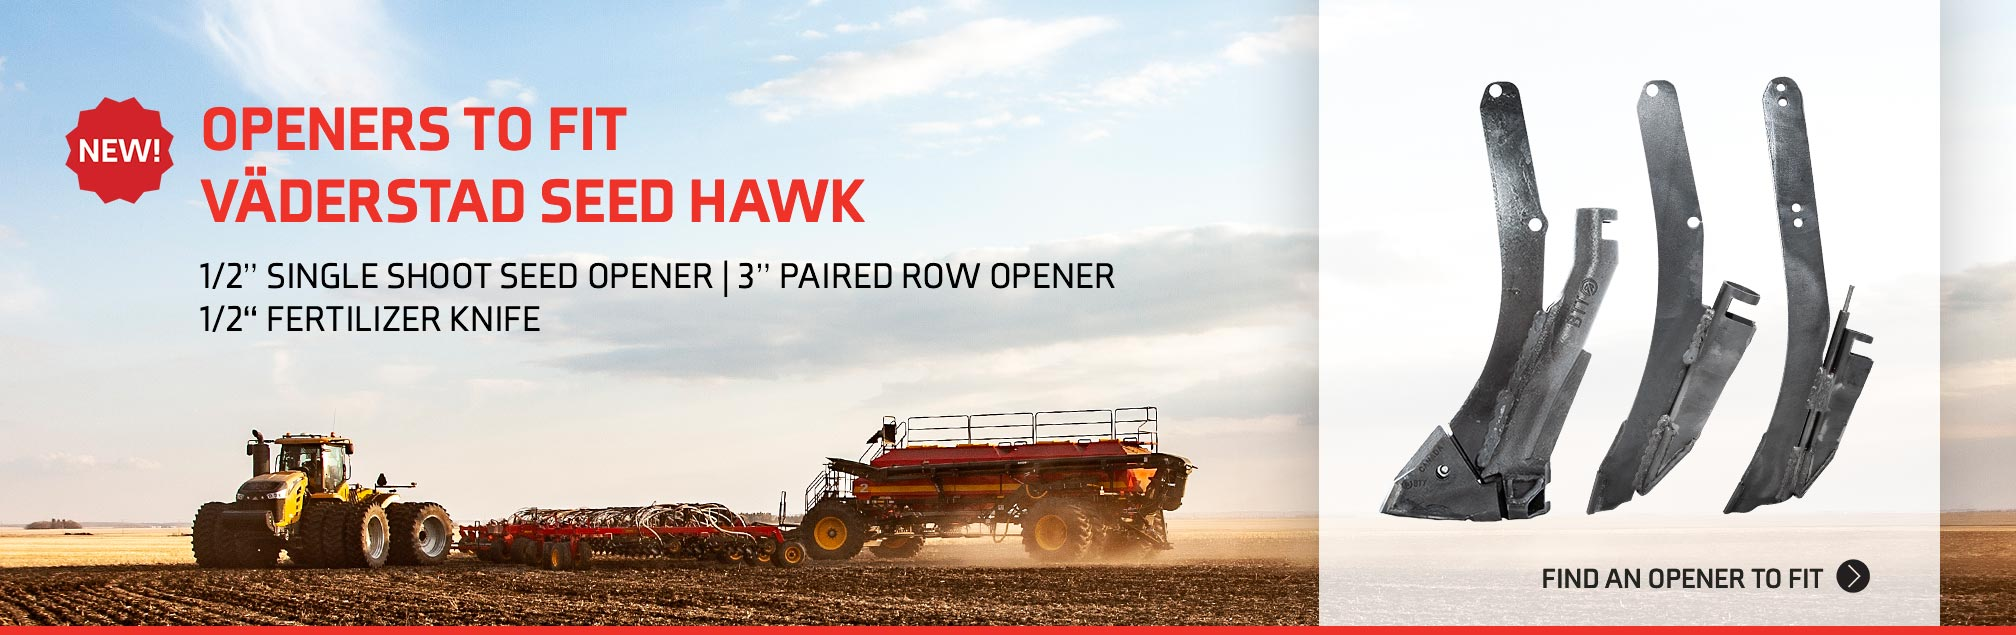 Website_Banner_Home_Vaderstad-Seed-Hawk-Opener